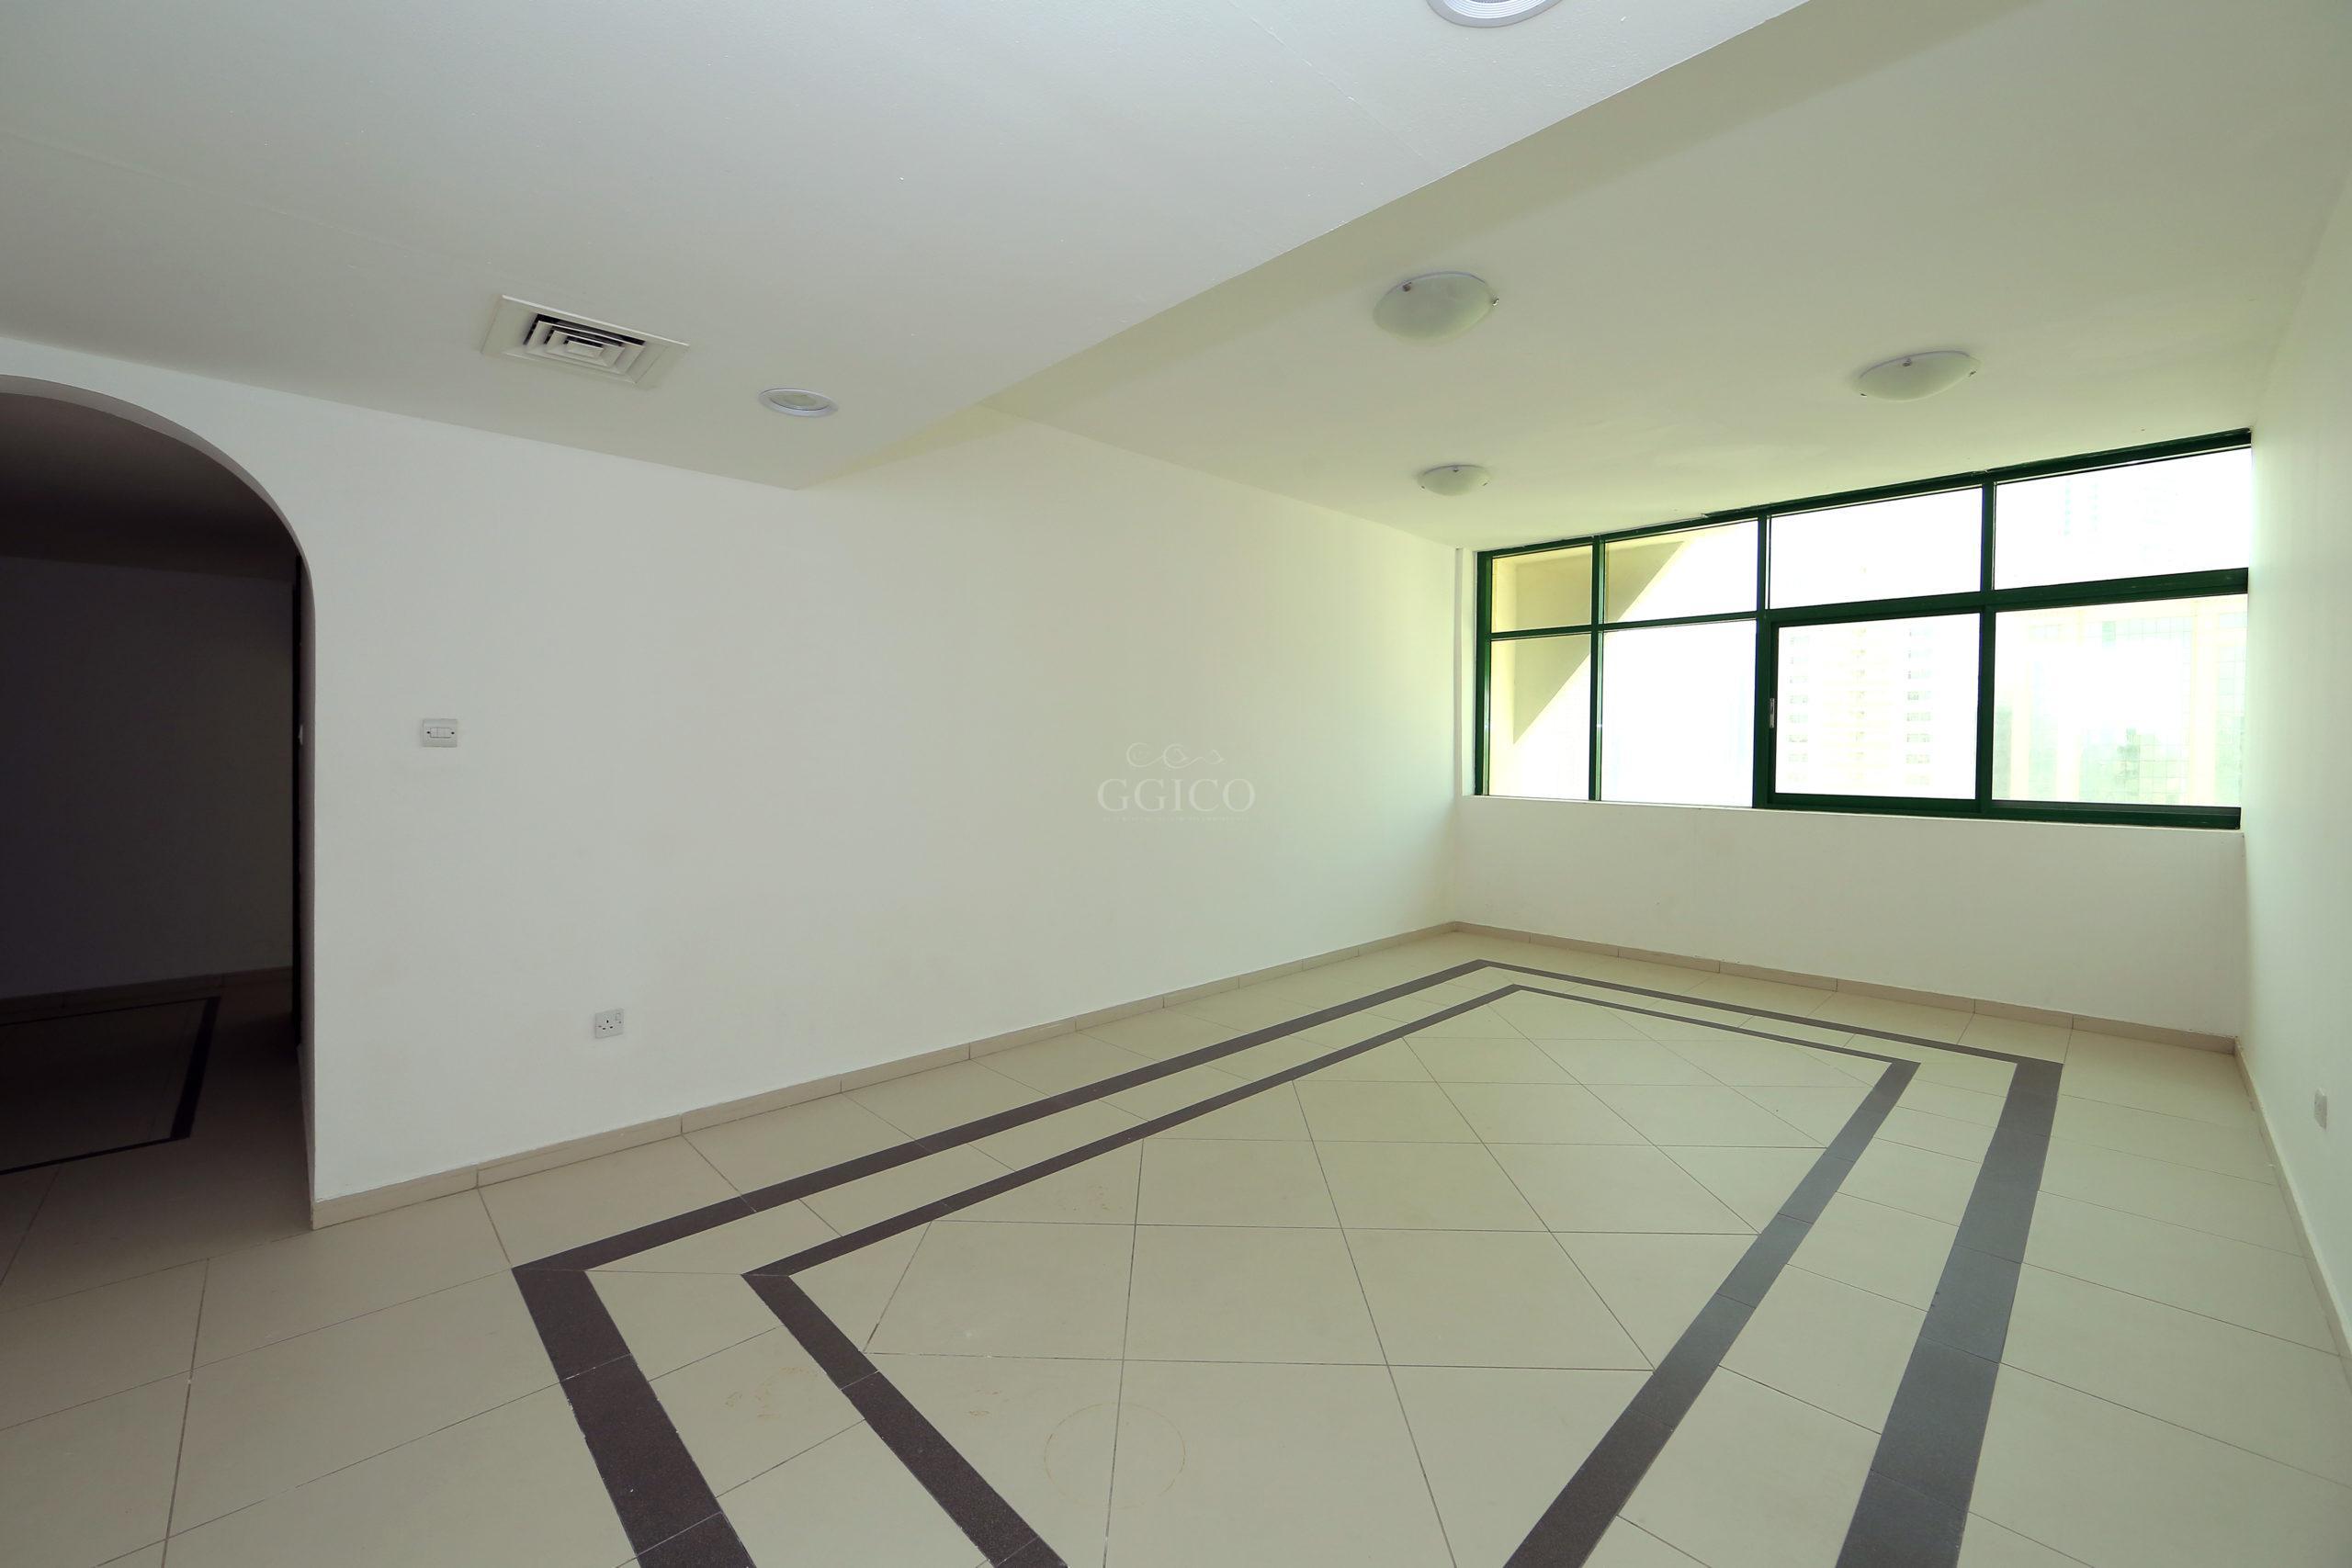 3 Bedroom in Al Taawun Sharjah